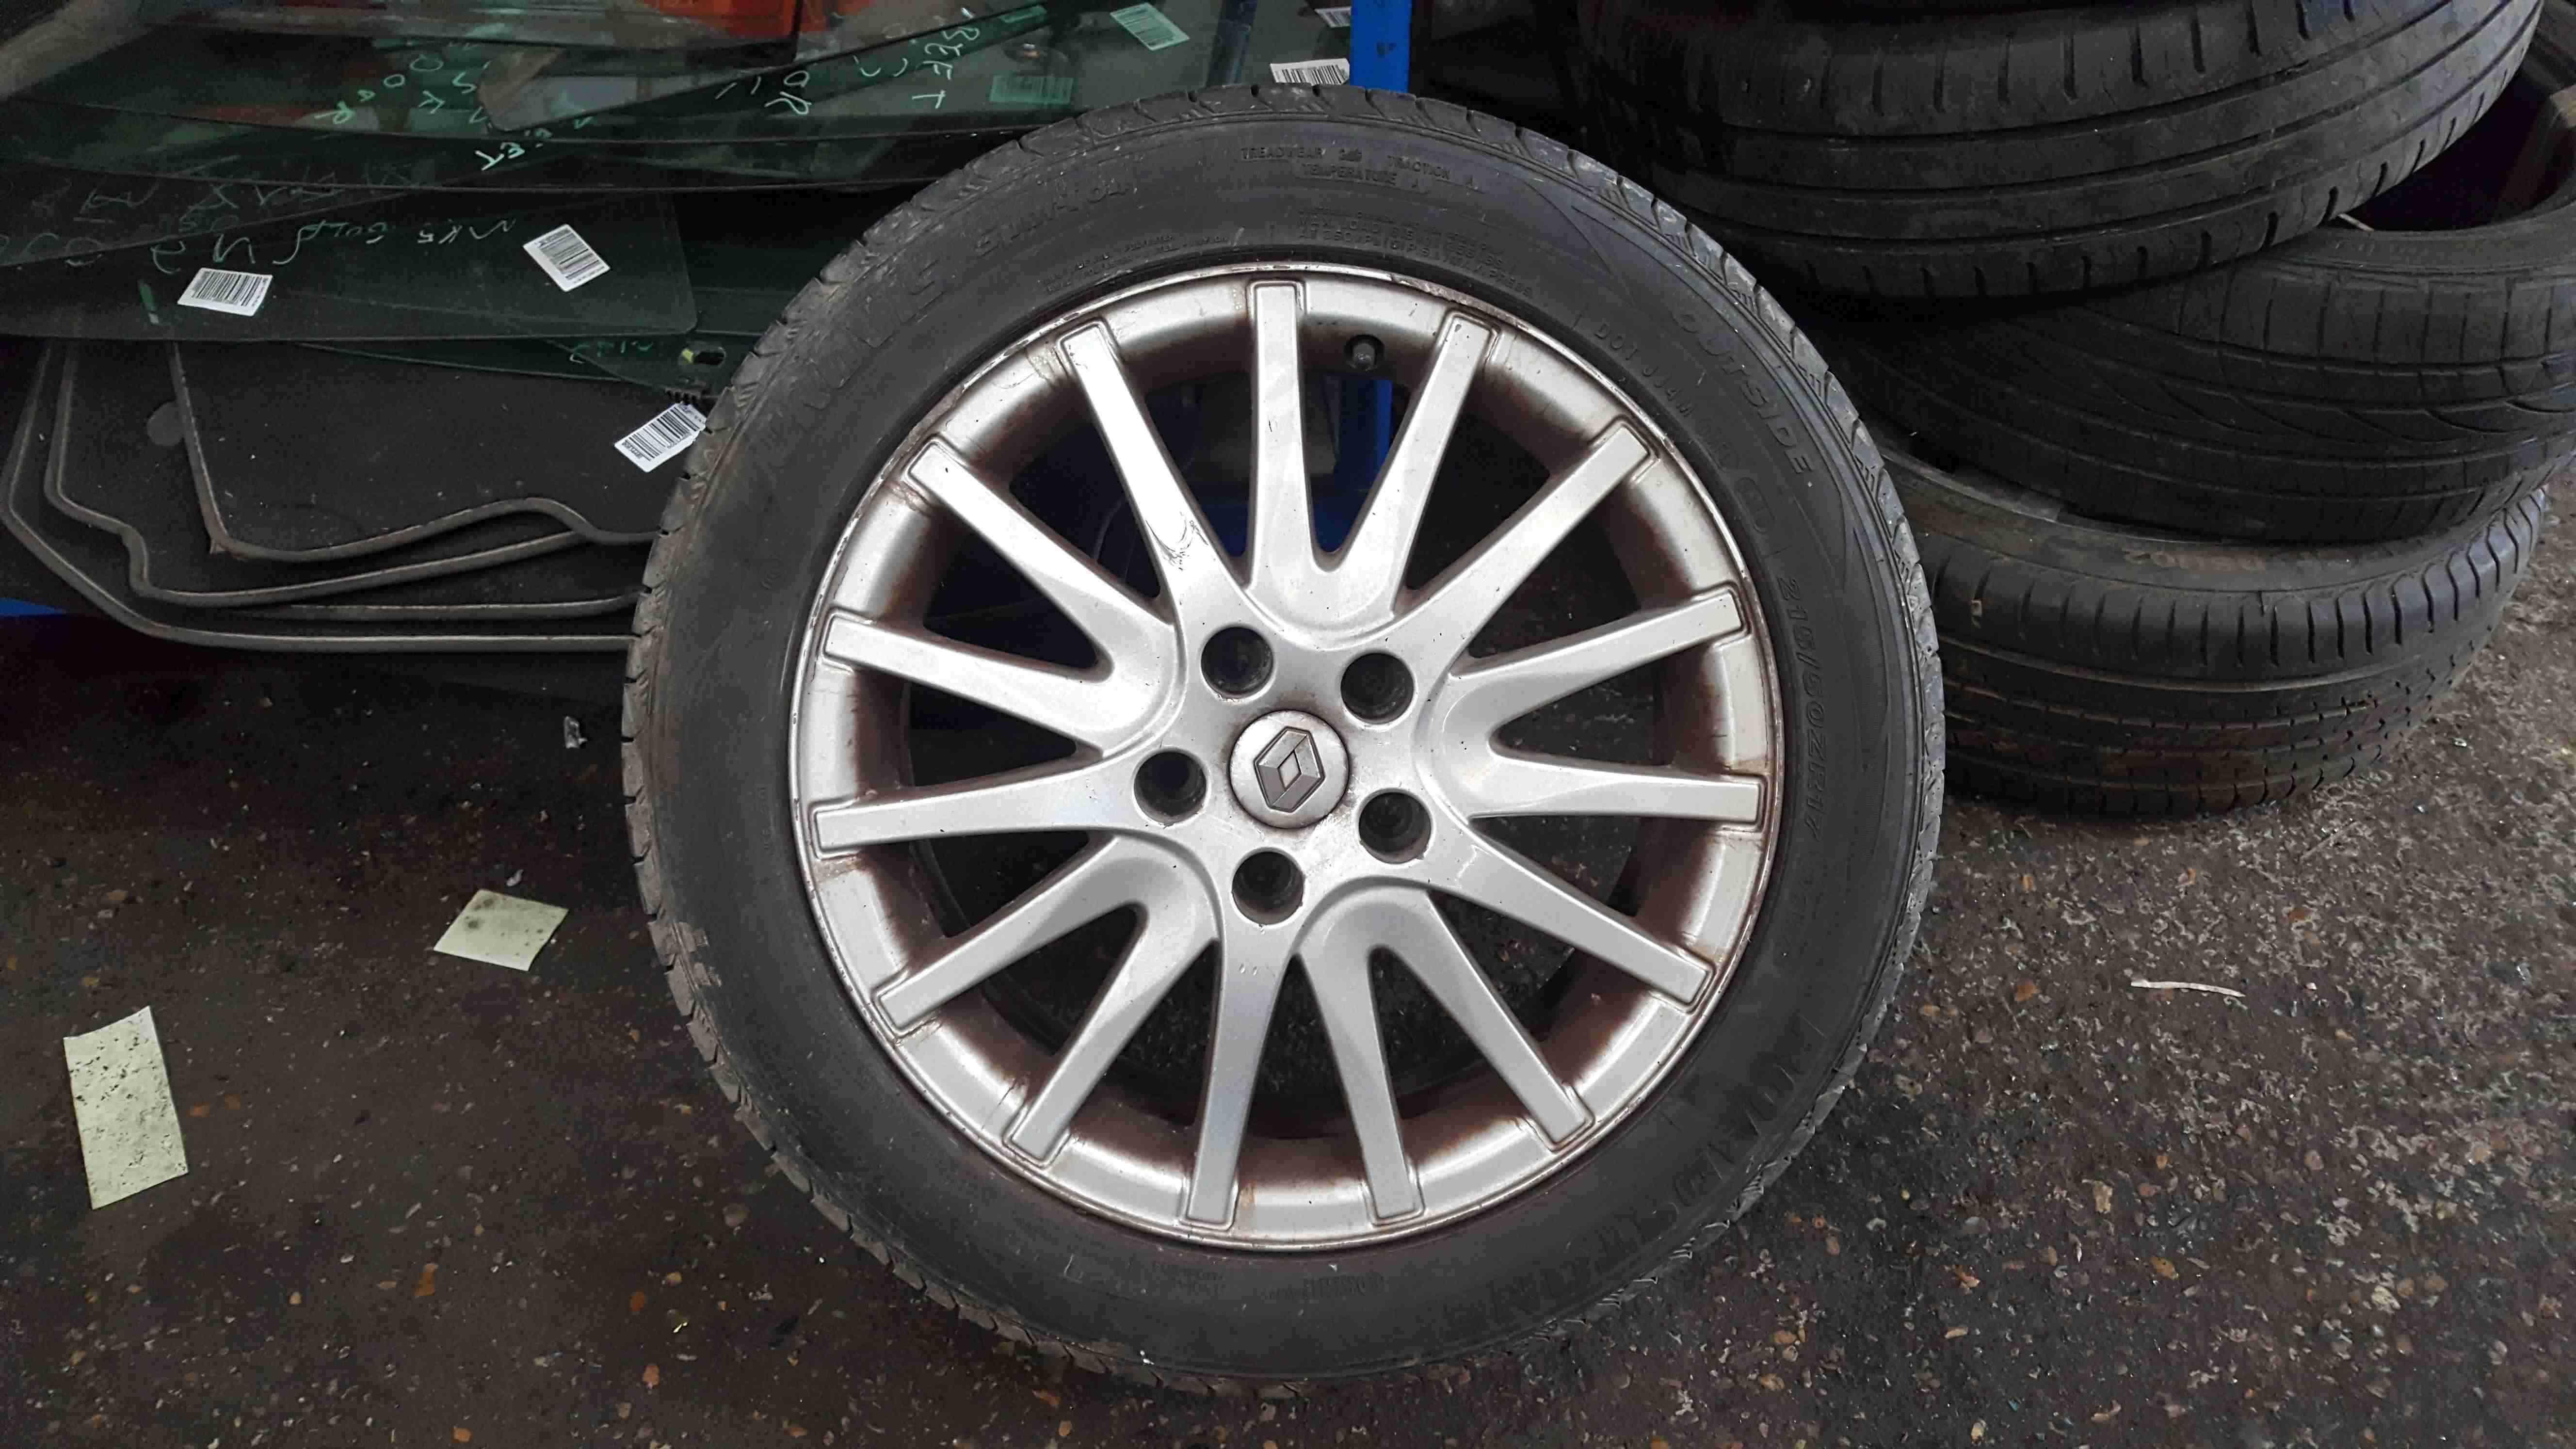 Renault Laguna MK3 2007-2012 Alloy Wheel 17inch + Tyre 215 50 17 6mm 403000034R